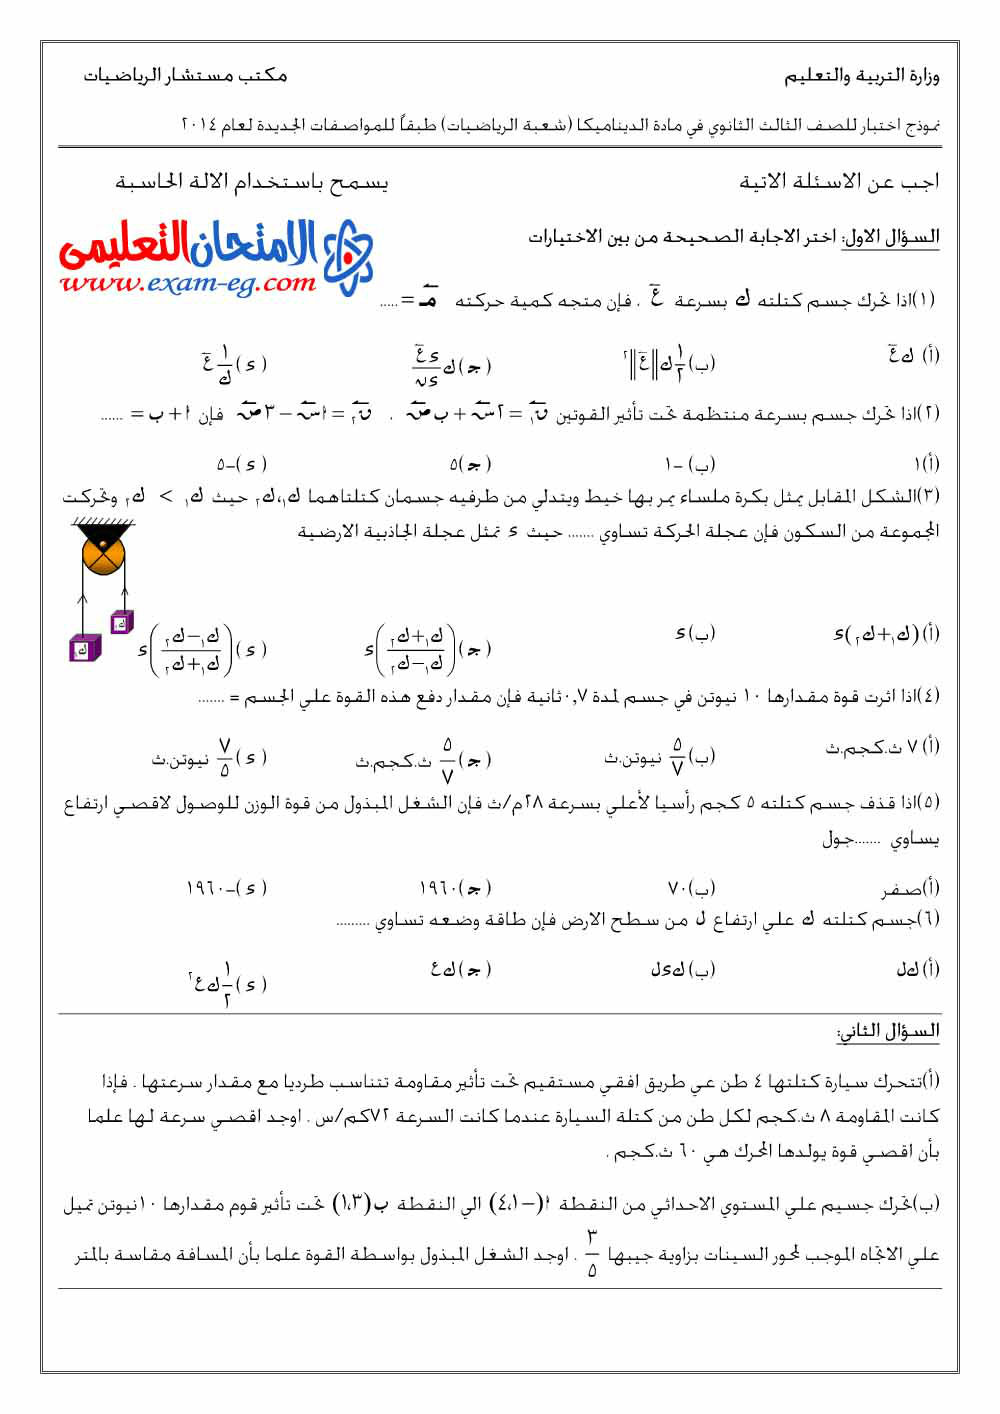 exam-eg.com_1403332950463.jpg